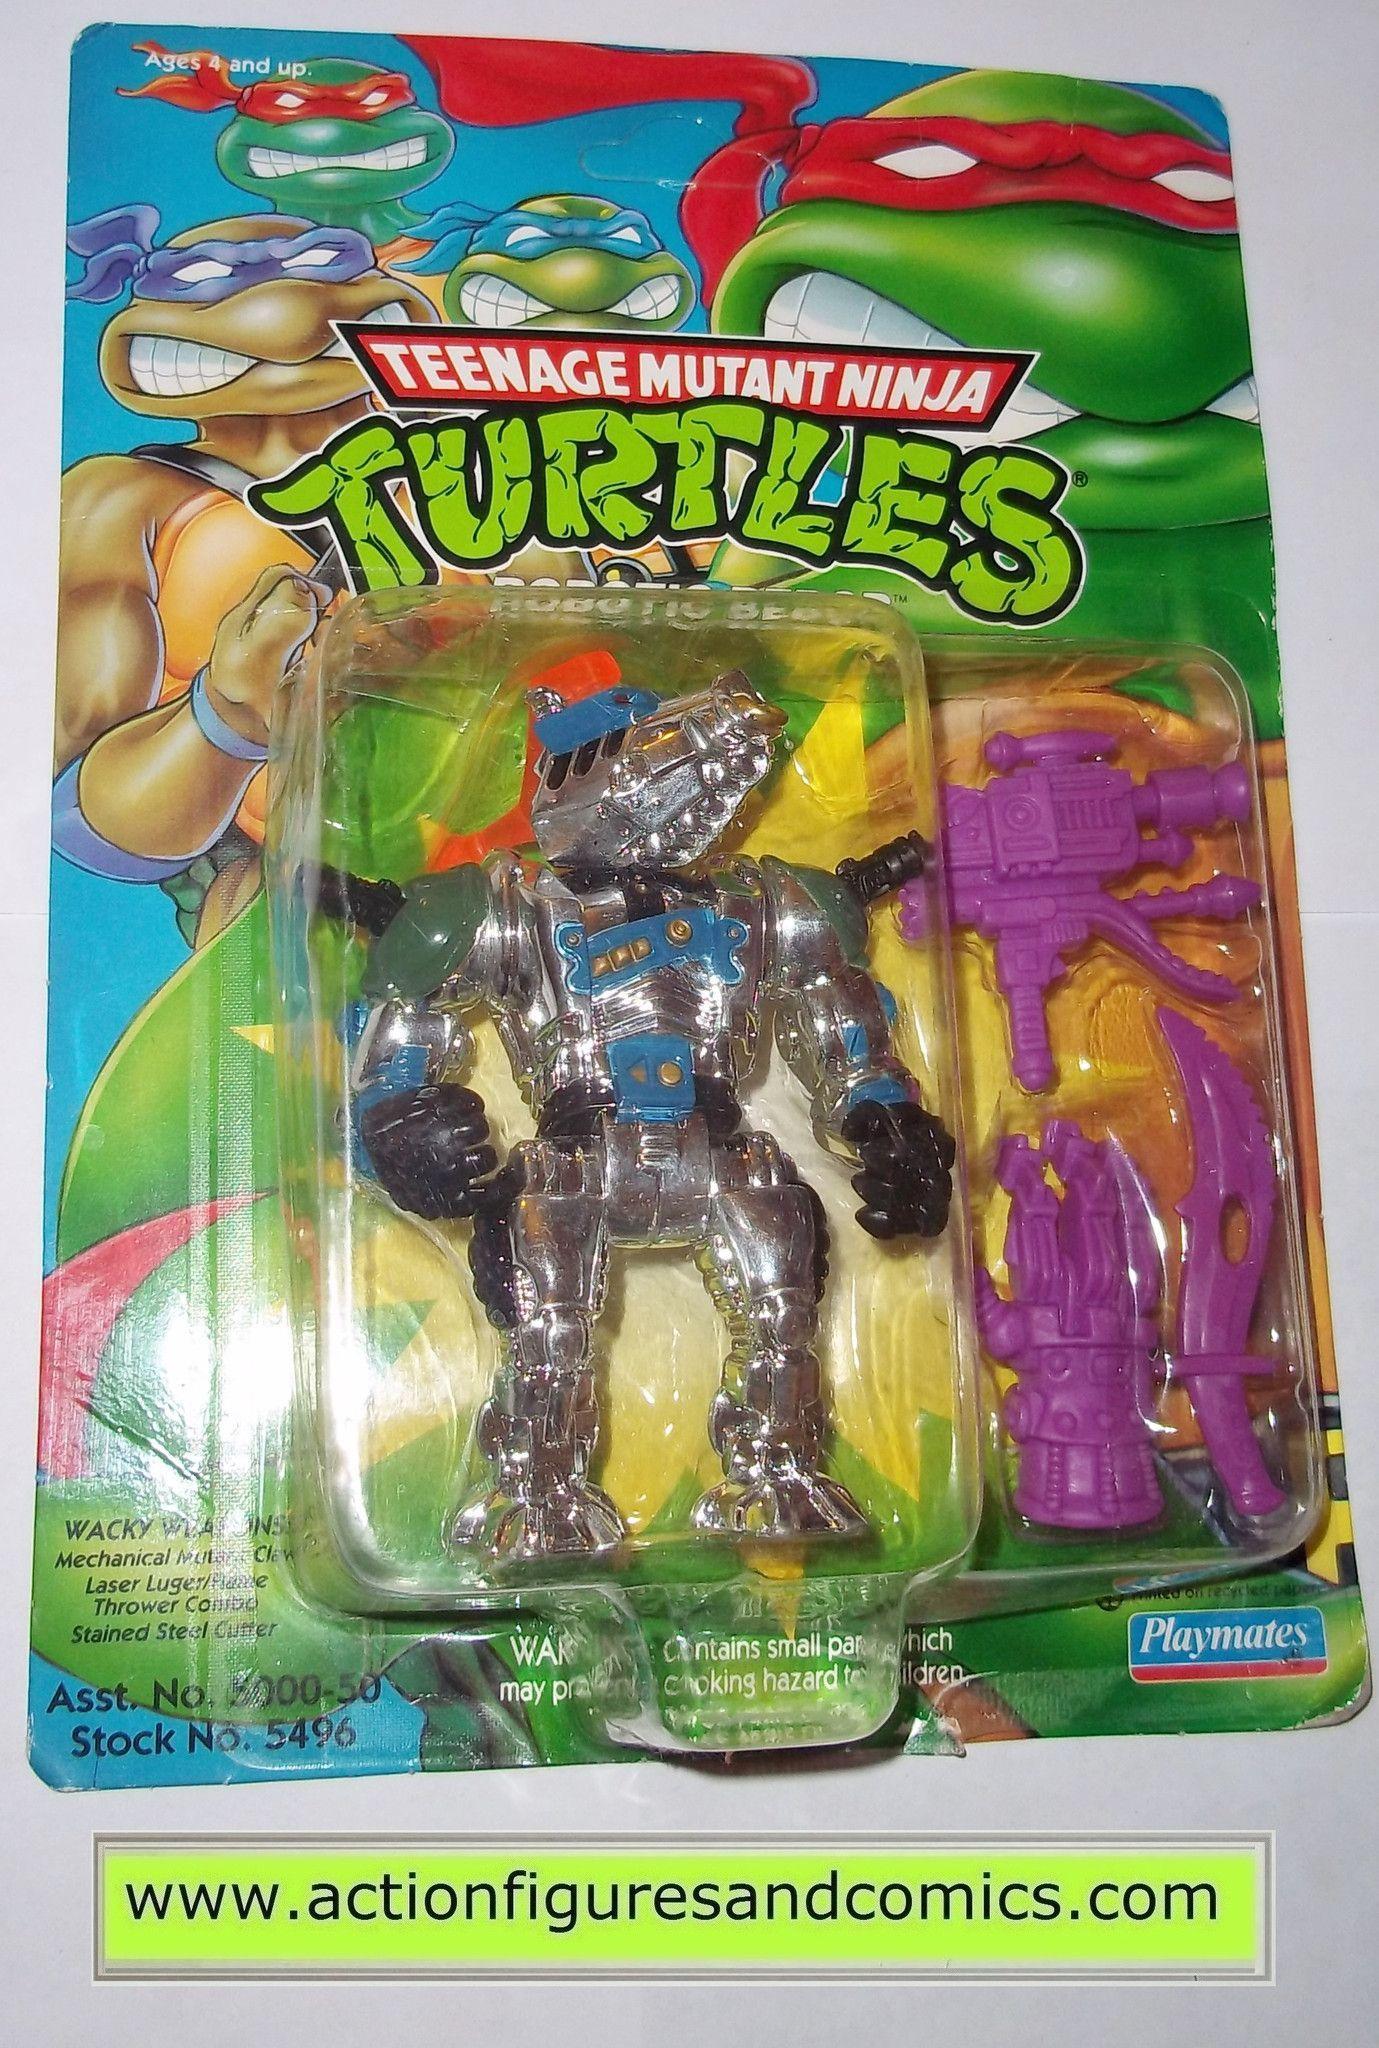 Air Hogs Sharpshooter Grey Green By 6495 Snap Circuits Ac Adapter Image One Xumpcom Teenage Mutant Ninja Turtles Bebop Robotic 1993 Vintage Playmates Toys Mib Moc Mip Tmnt 712